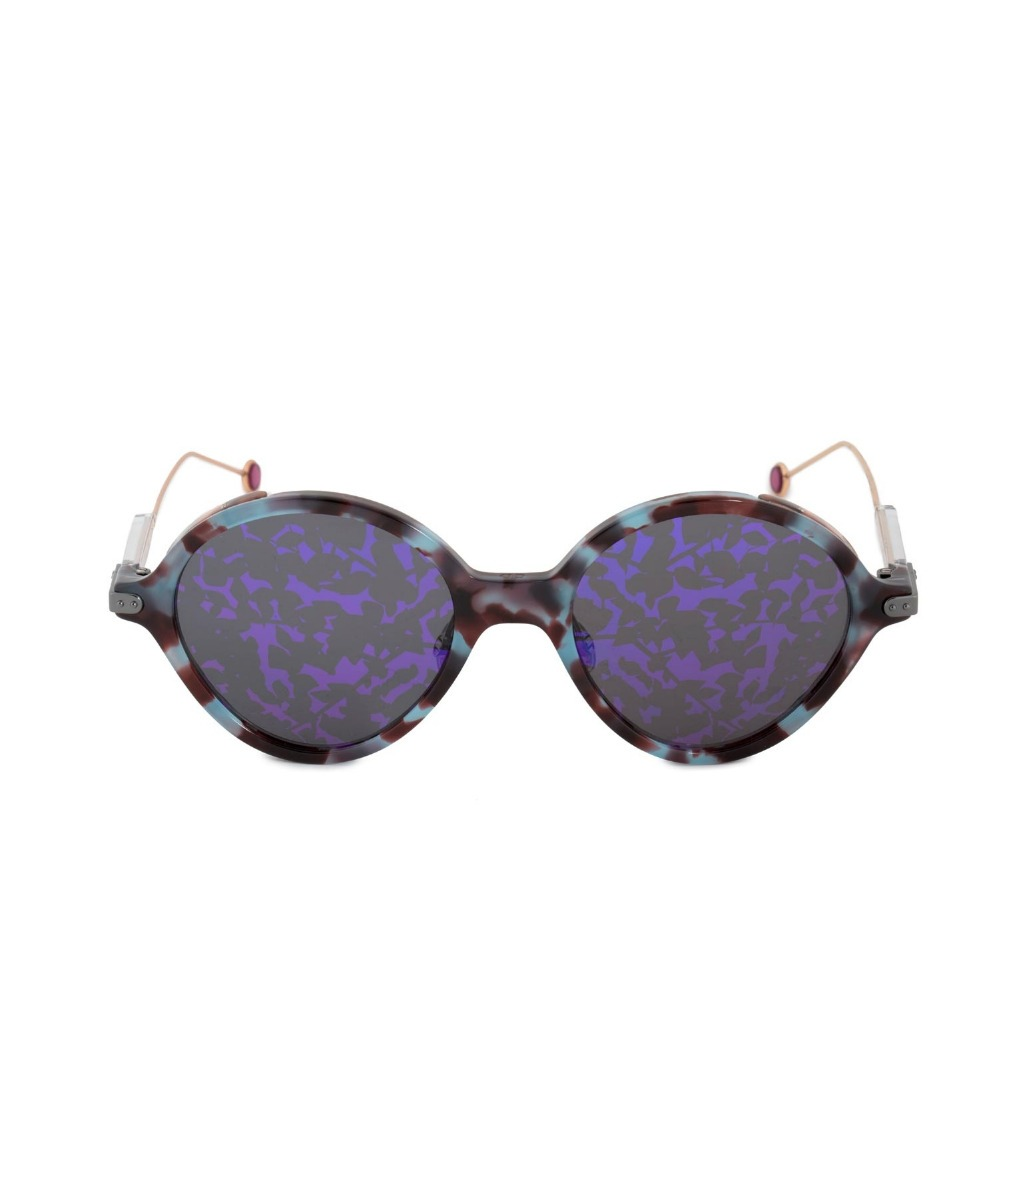 Umbrage Gafas Mjnty De Redondas Para Mujer Dior Purpura Sol 1c3FTlJK